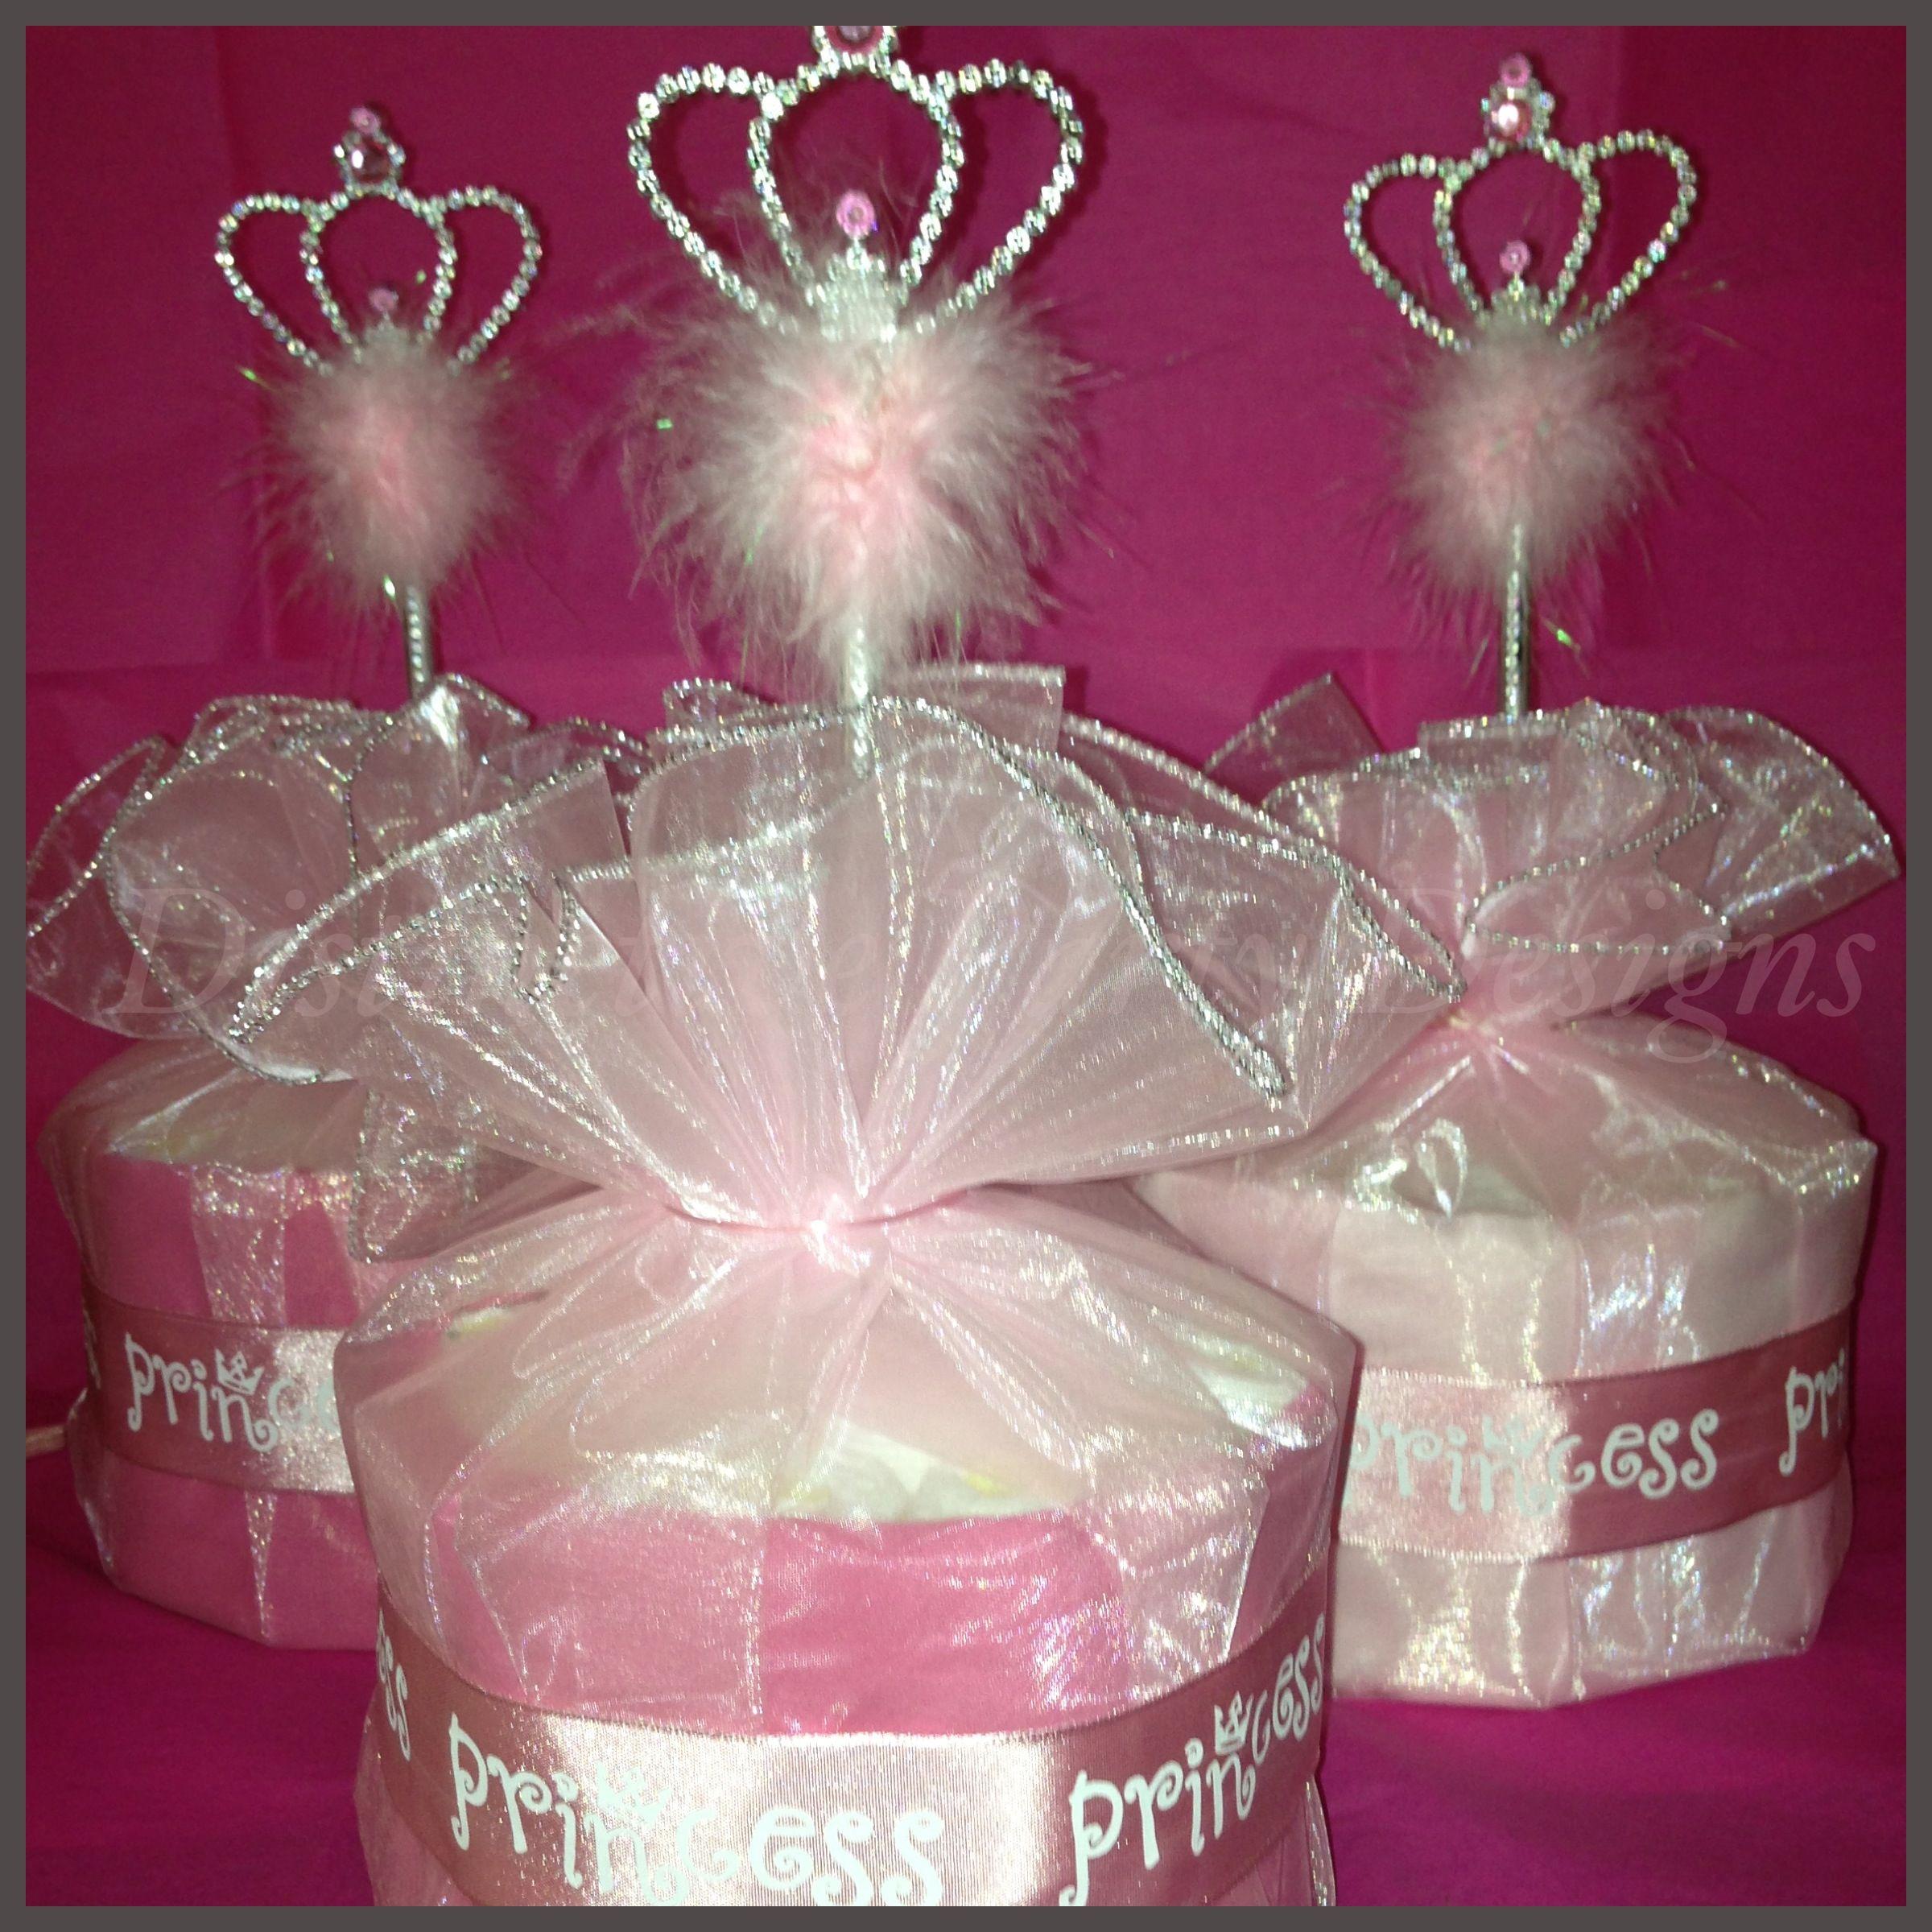 Mini Diaper Cake Table Centerpieces Created For A Princess Theme